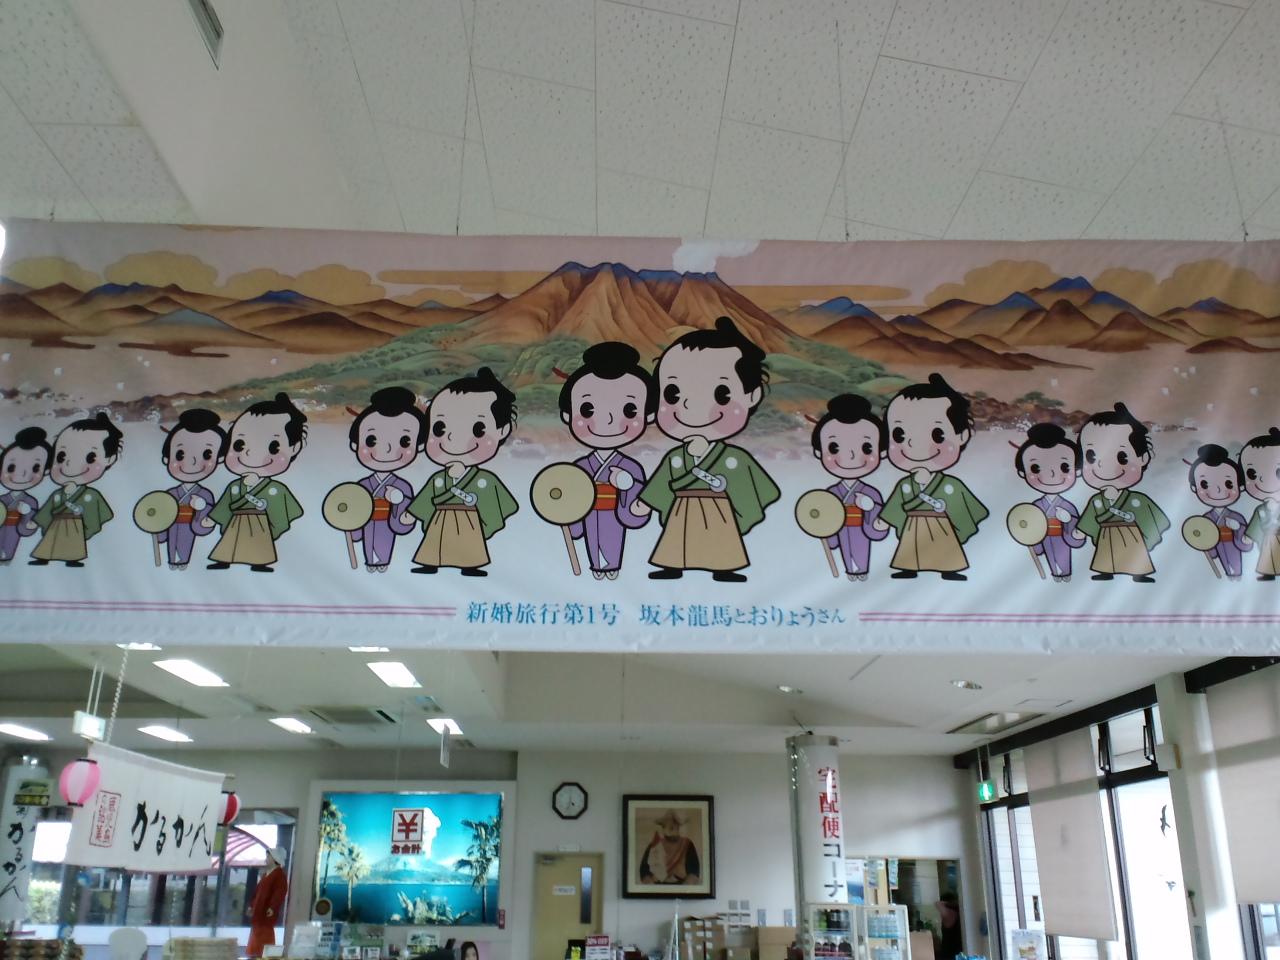 愛に恋! Eishin blog: 兄、鹿児島空港到着!